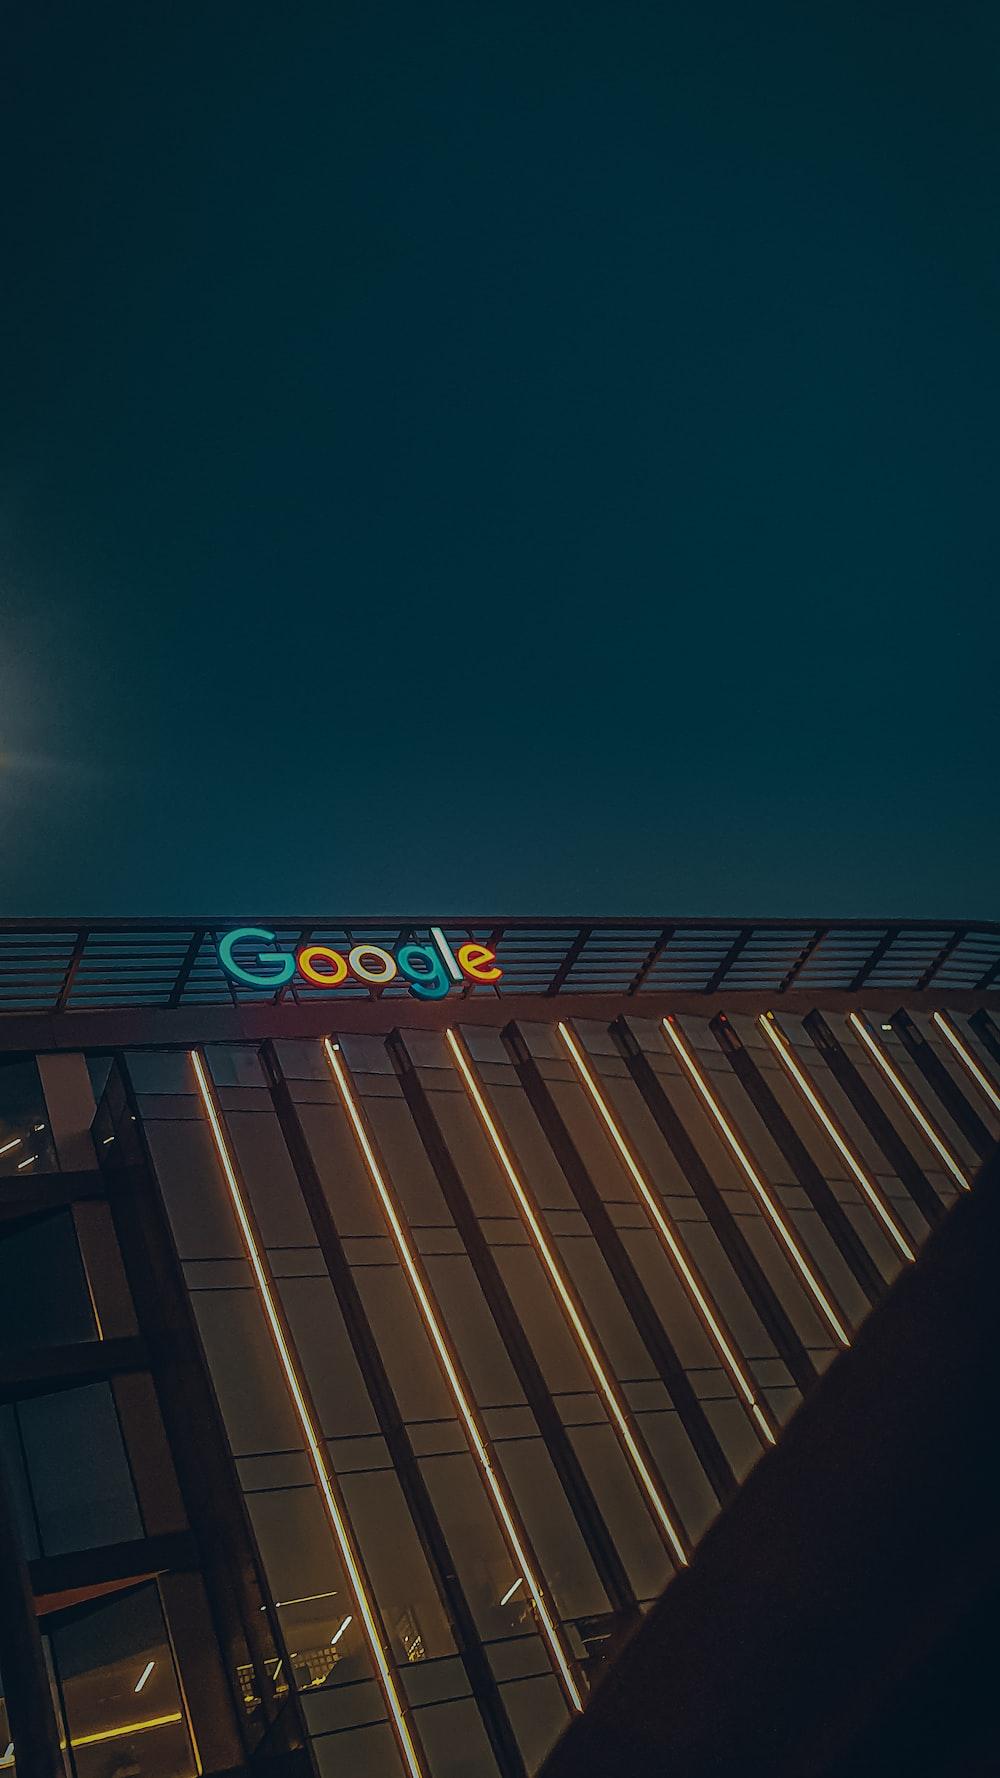 black and blue lighted signage